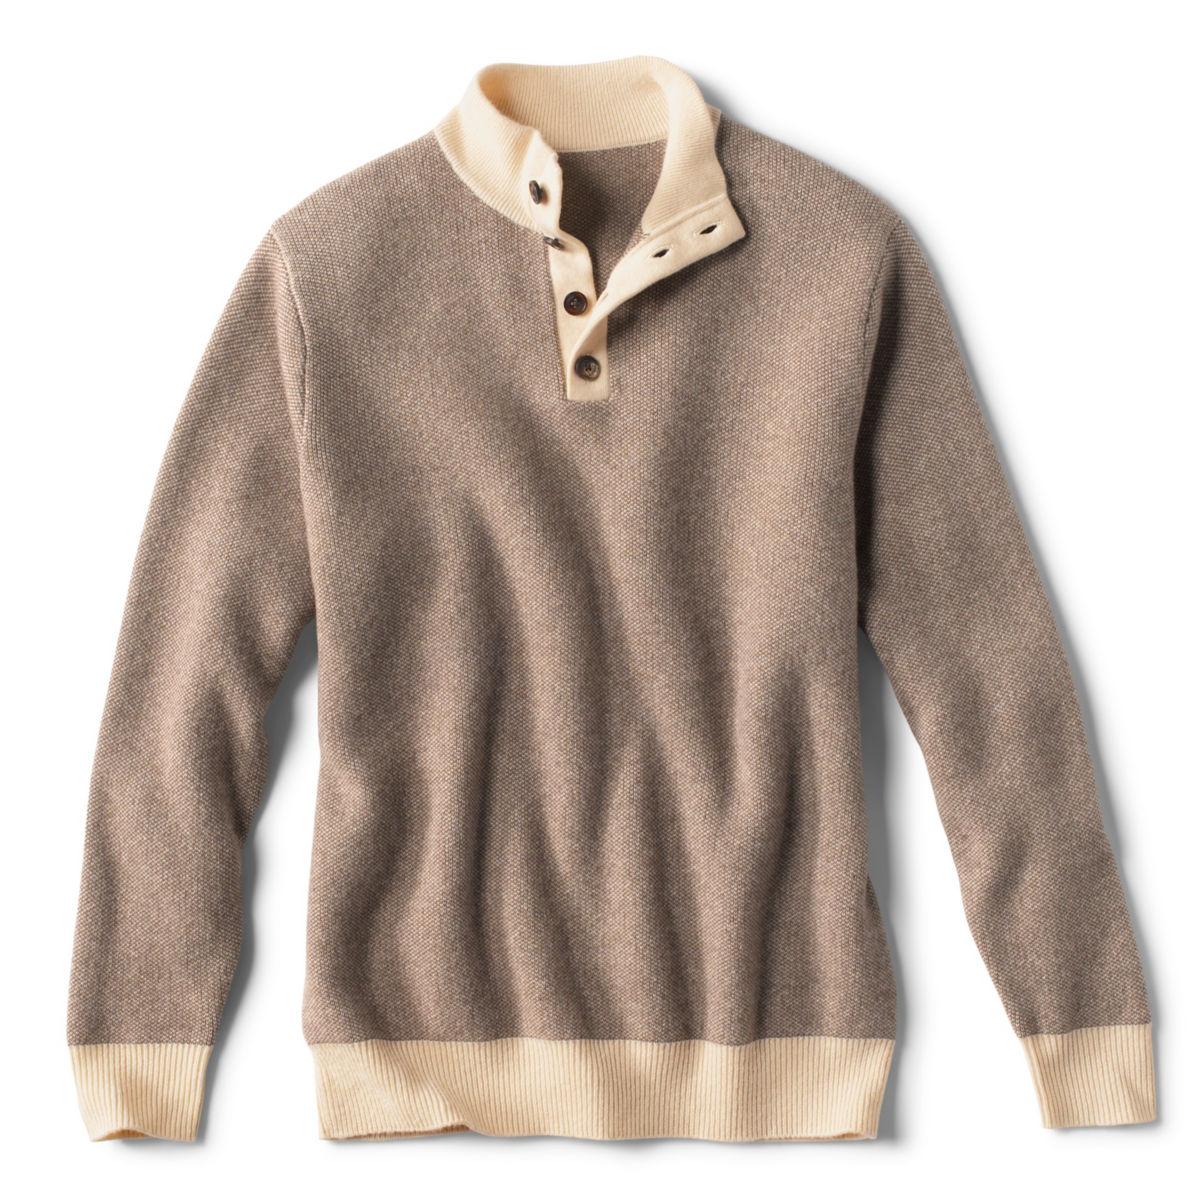 Pure Cashmere Simoom Sweater - CHOCOLATEimage number 0